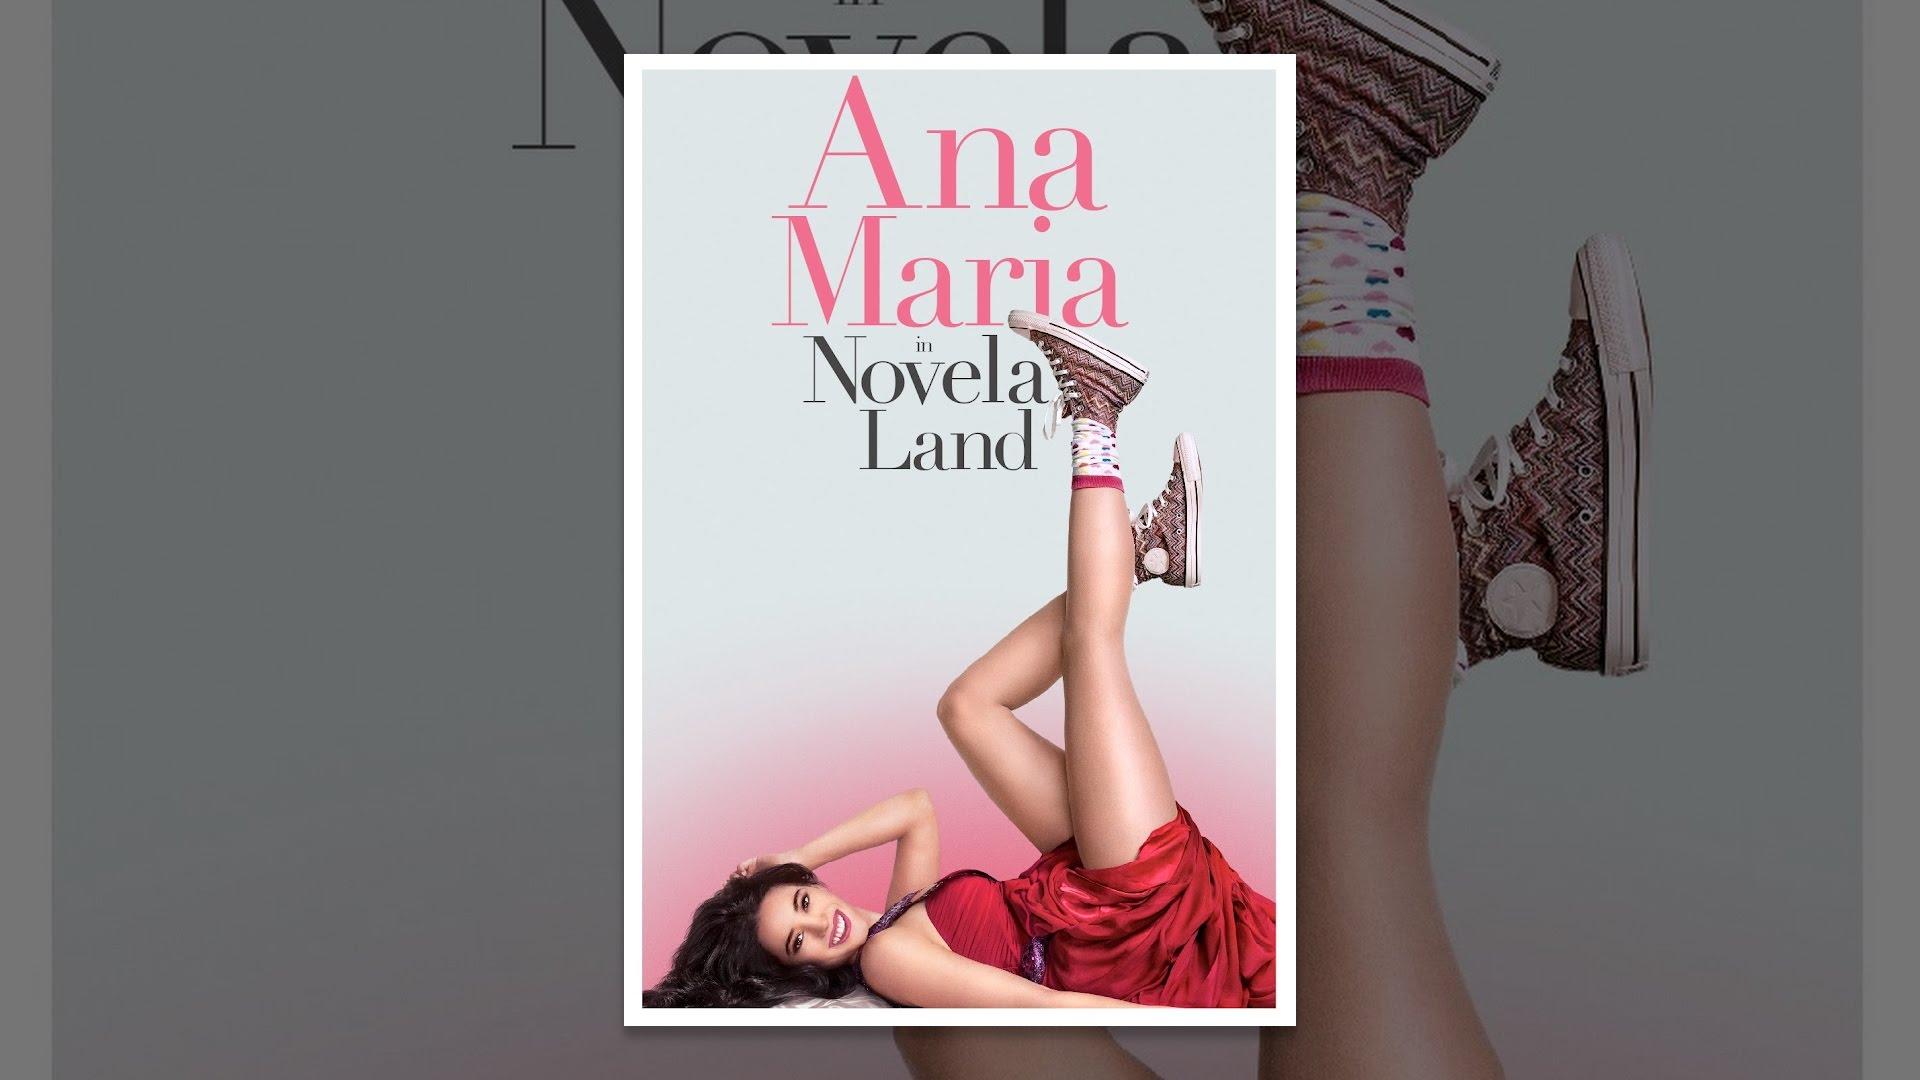 Ana Maria in Novela Land Ana Maria in Novela Land